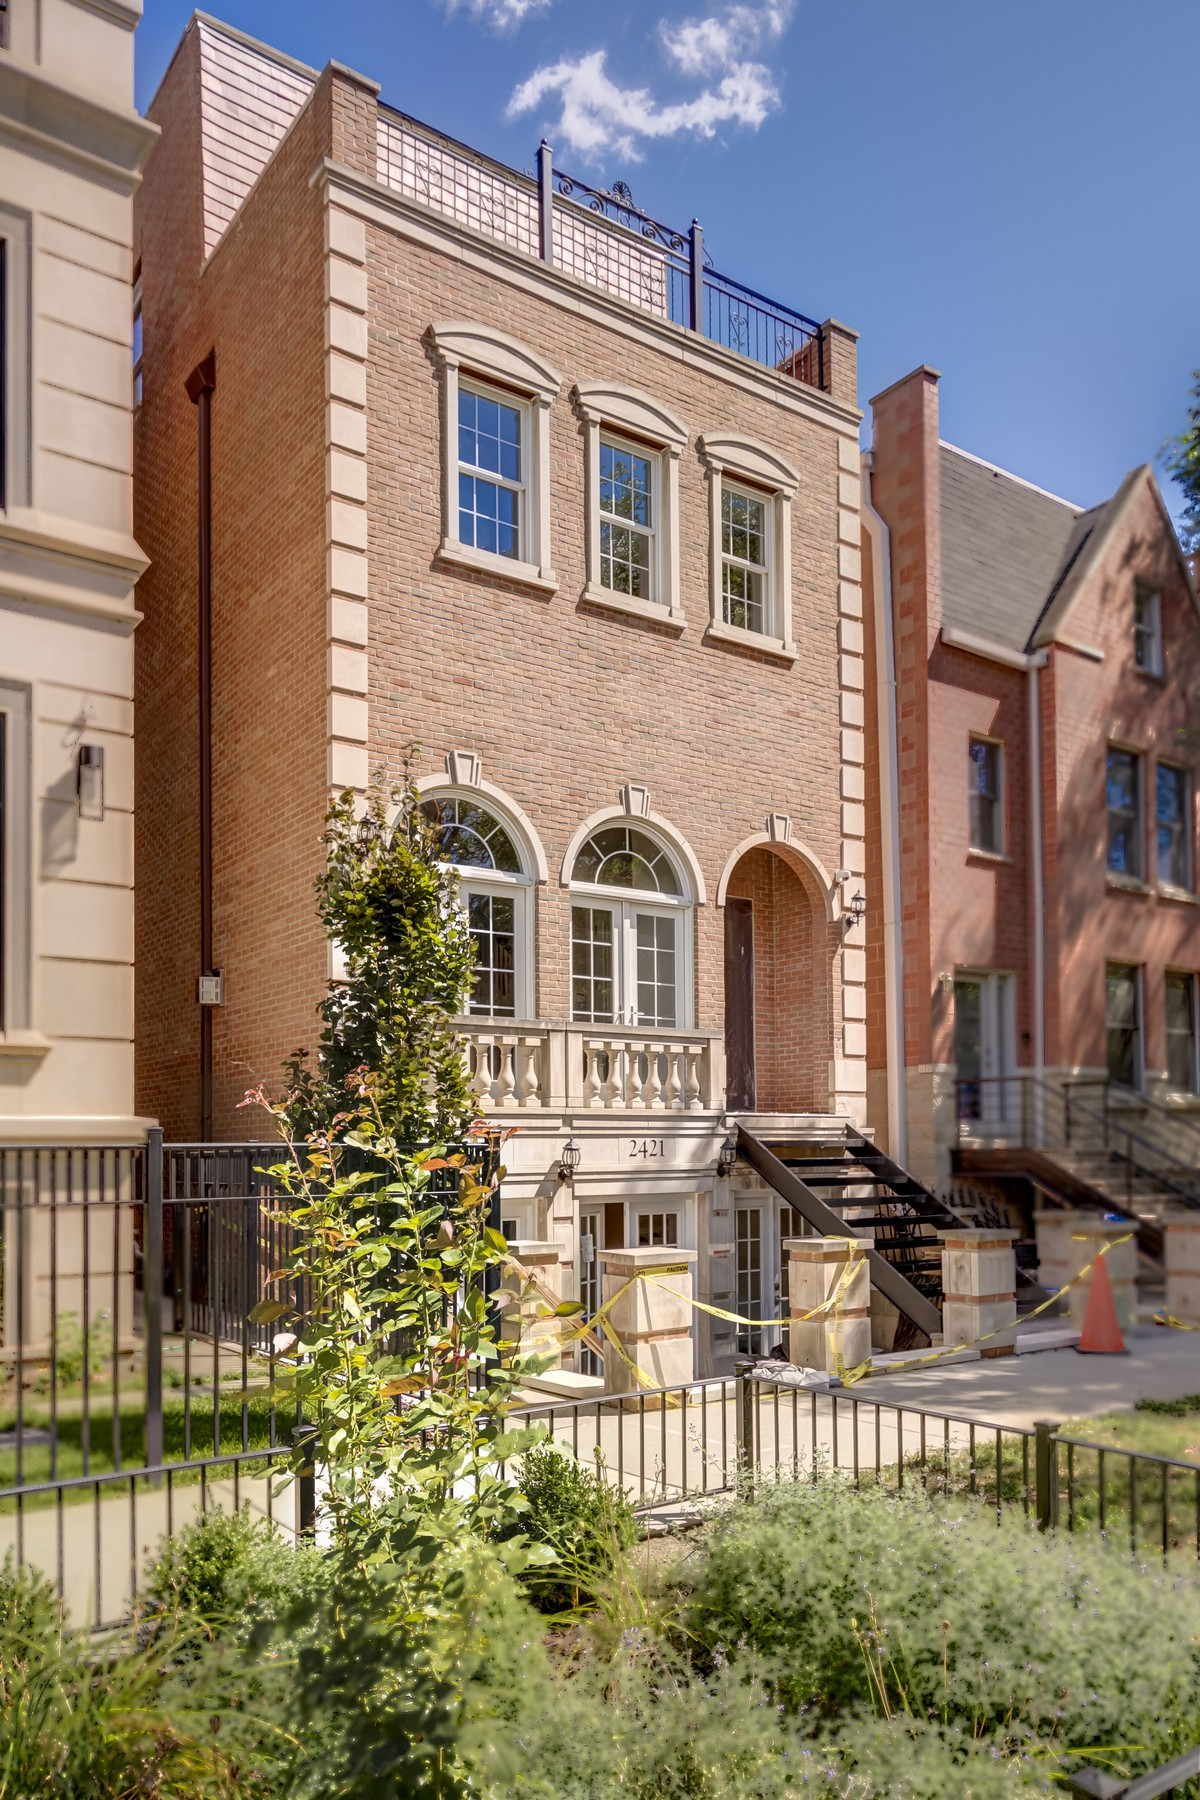 Villa per Vendita alle ore Spectacular Fully Remodeled Home In Lincoln Park 2421 N Janssen Avenue Lincoln Park, Chicago, Illinois 60614 Stati Uniti